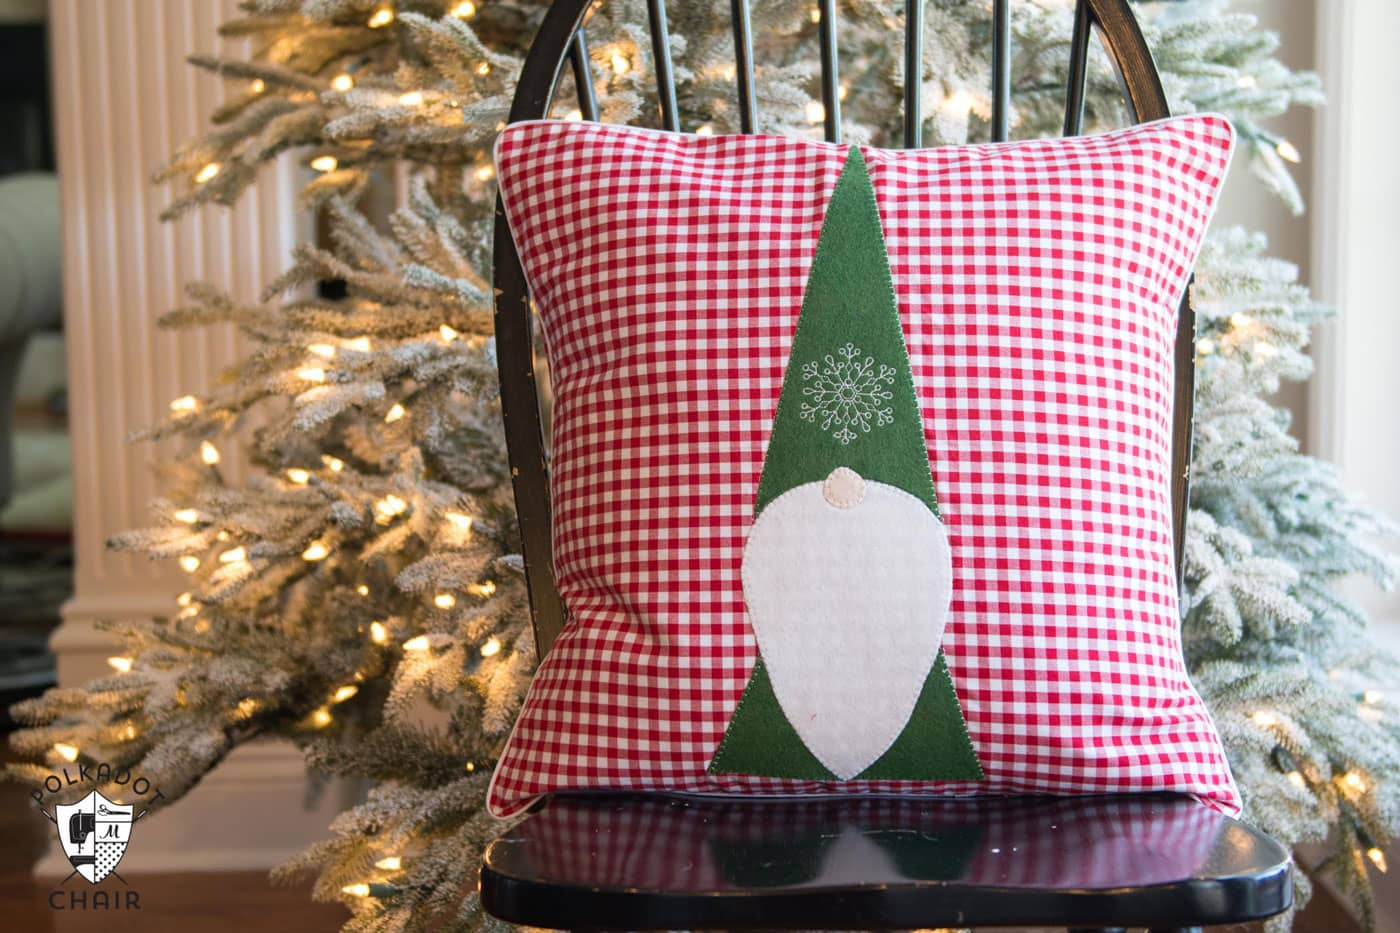 Tomte Christmas Gnome Pillow Pattern - The Polka Dot Chair